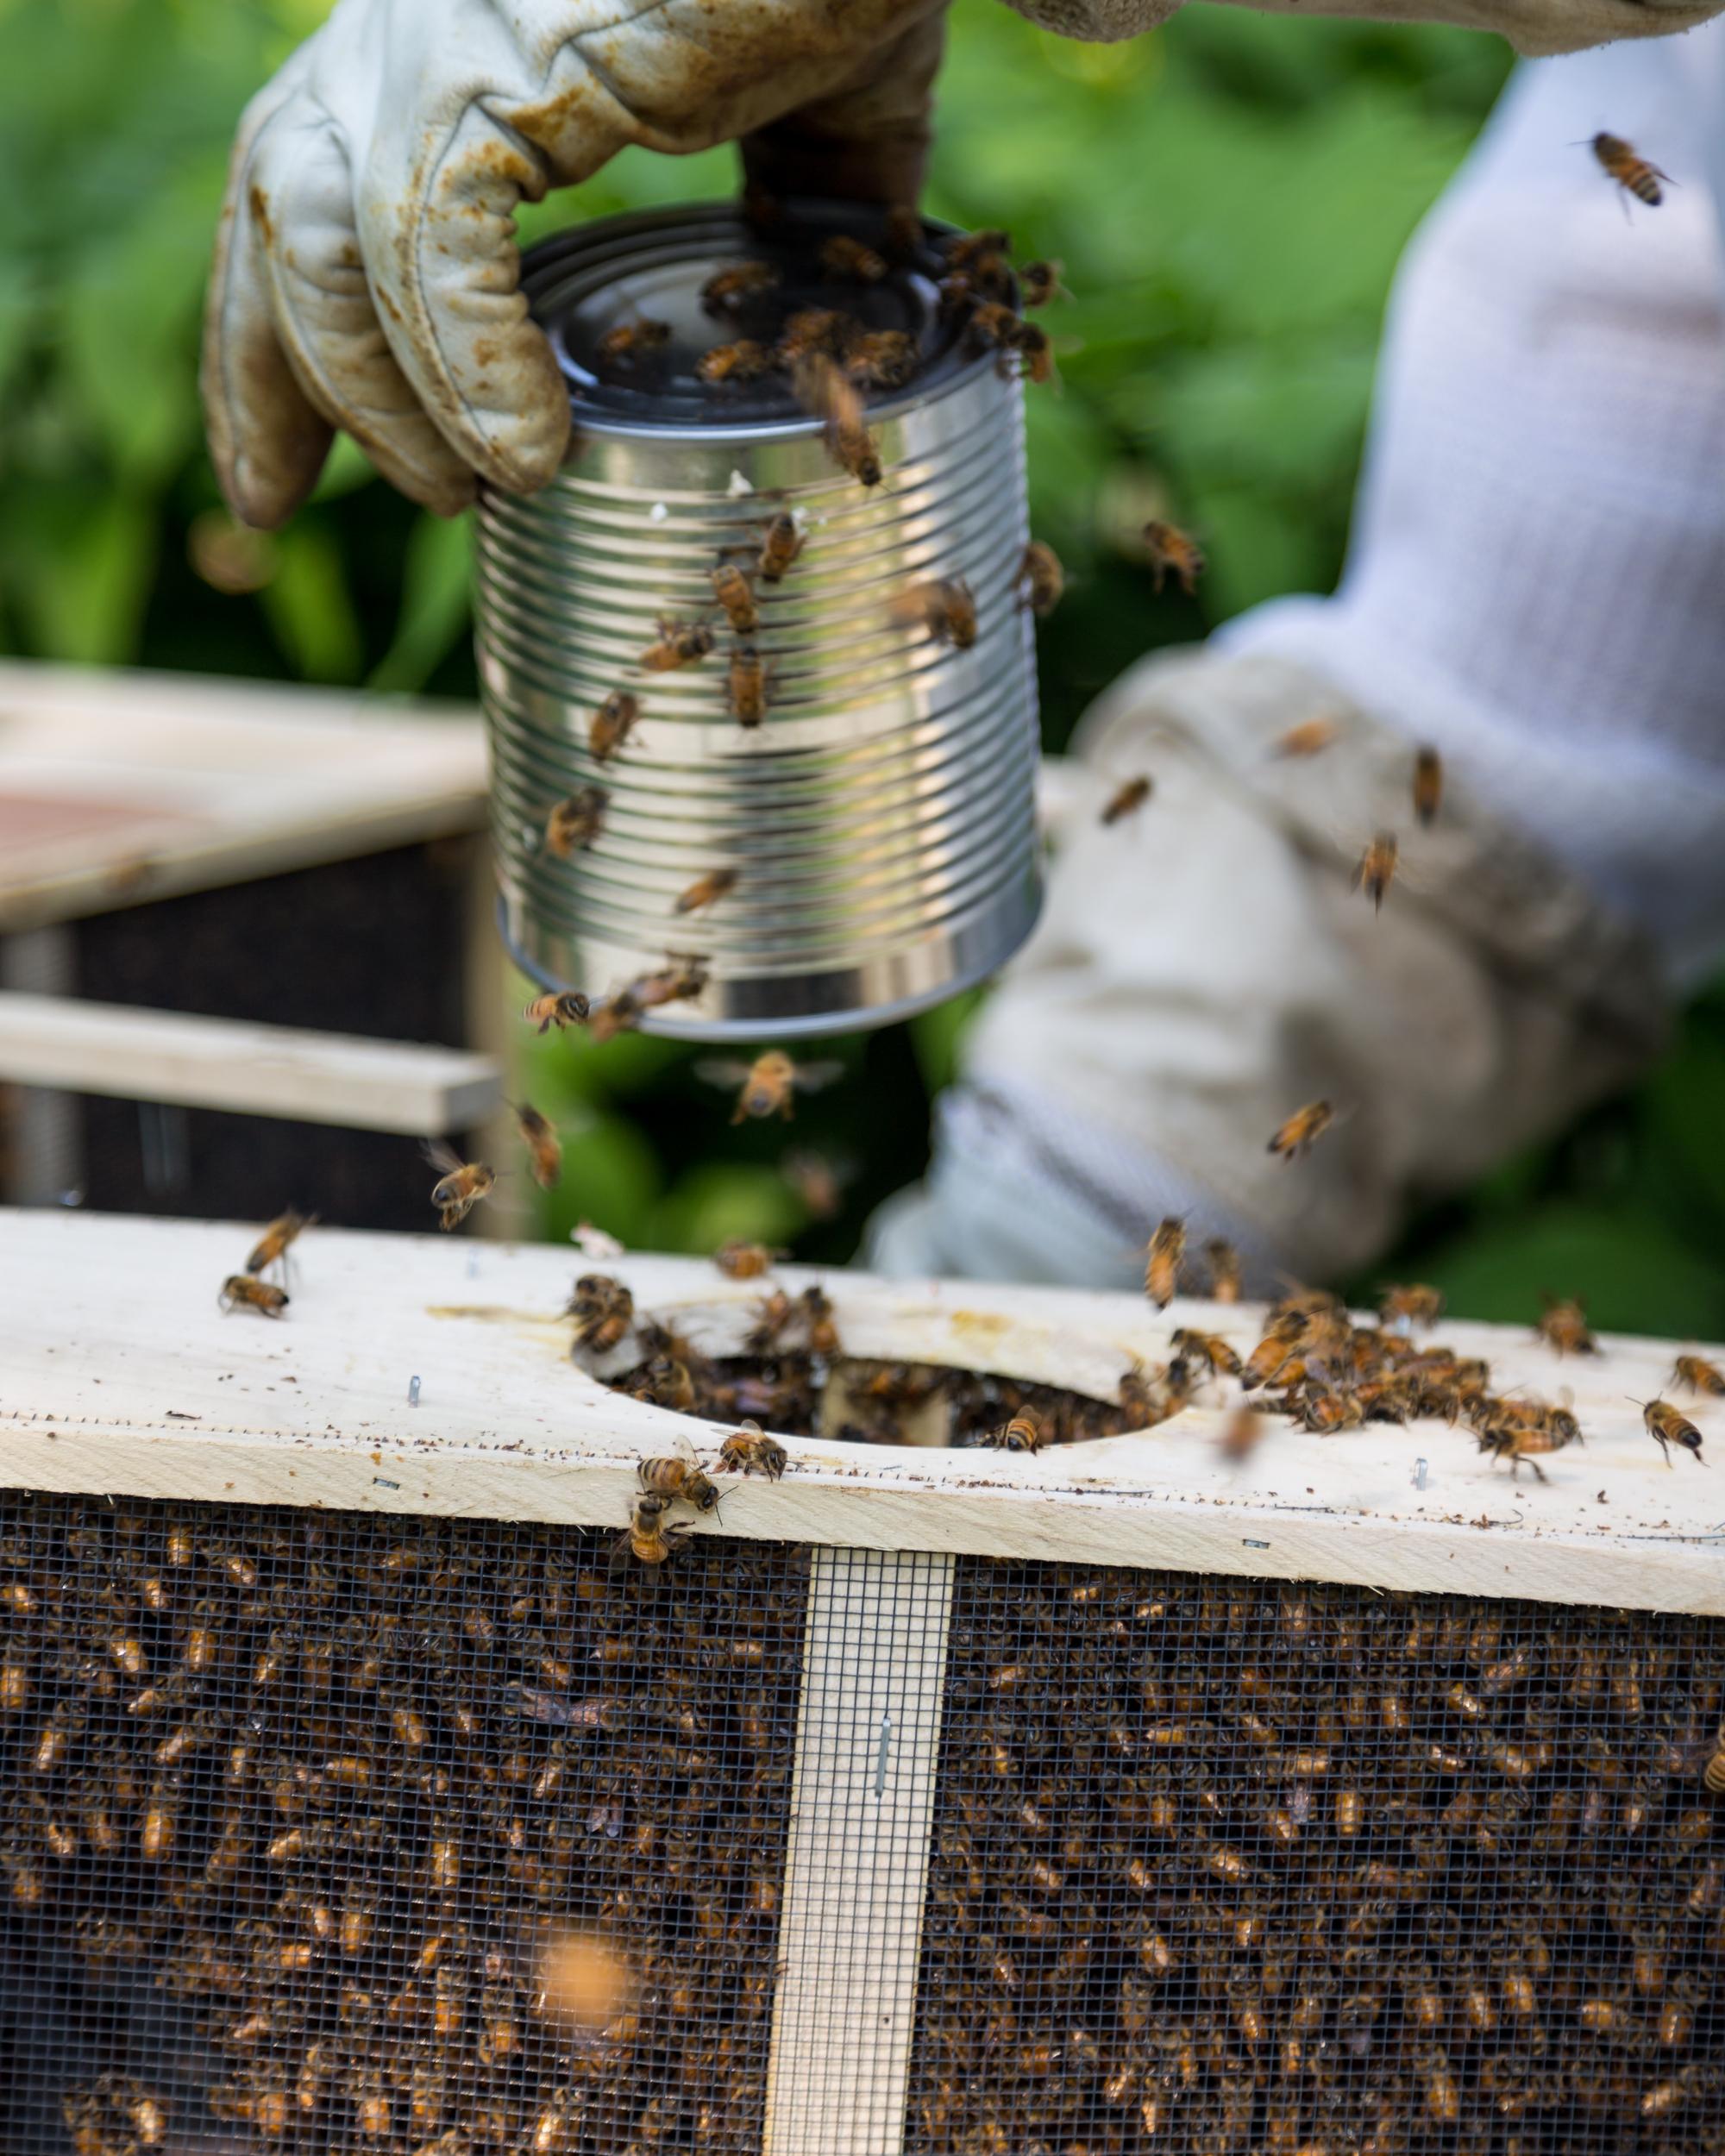 Beekeeper-16.jpg